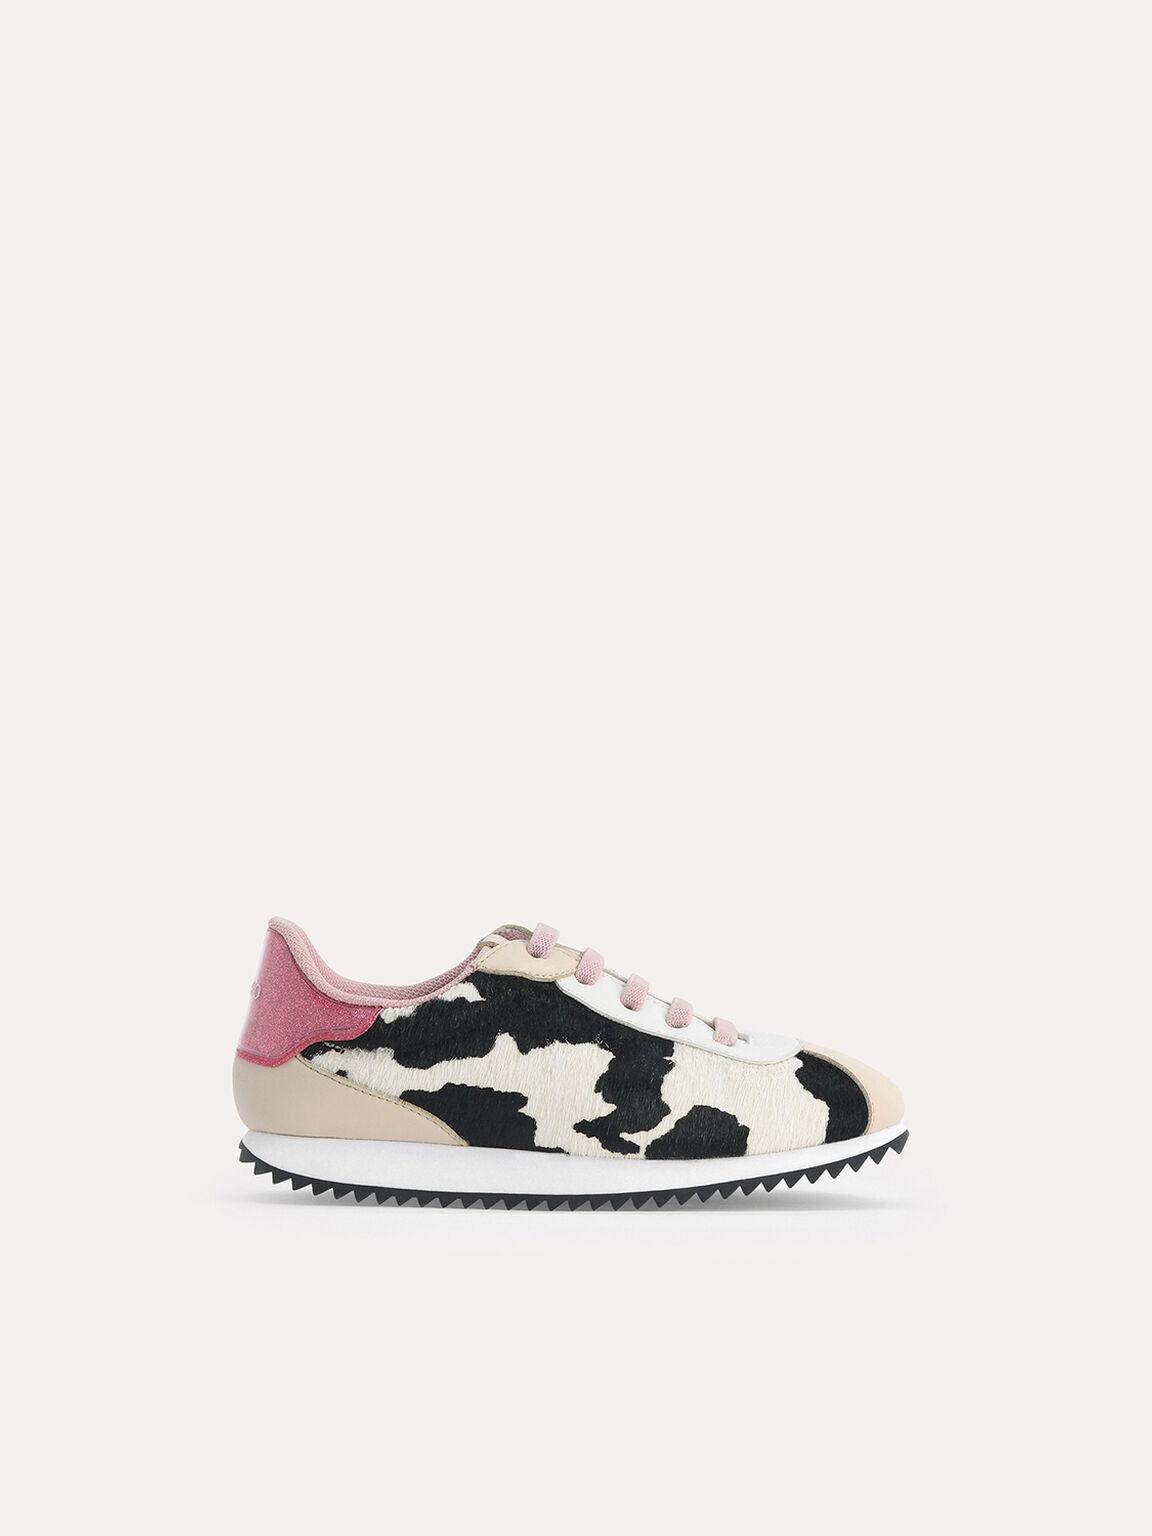 Cow Printed Sneakers, Sand, hi-res